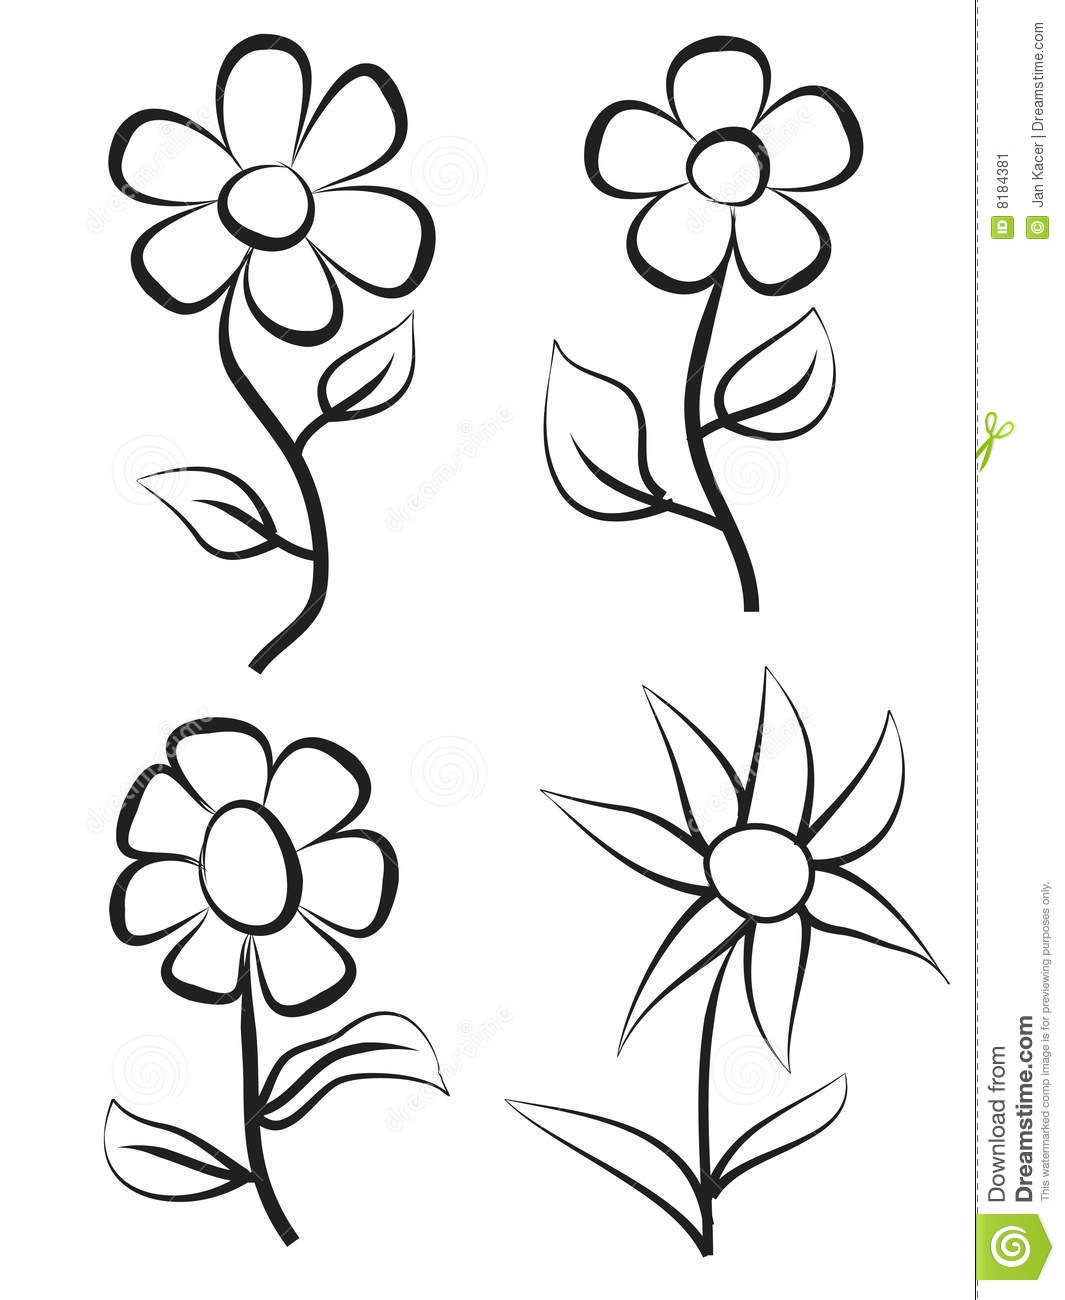 easy plants to draw Как нарисовать цветок сакуры поэтапно для начинающих easy to draw plants